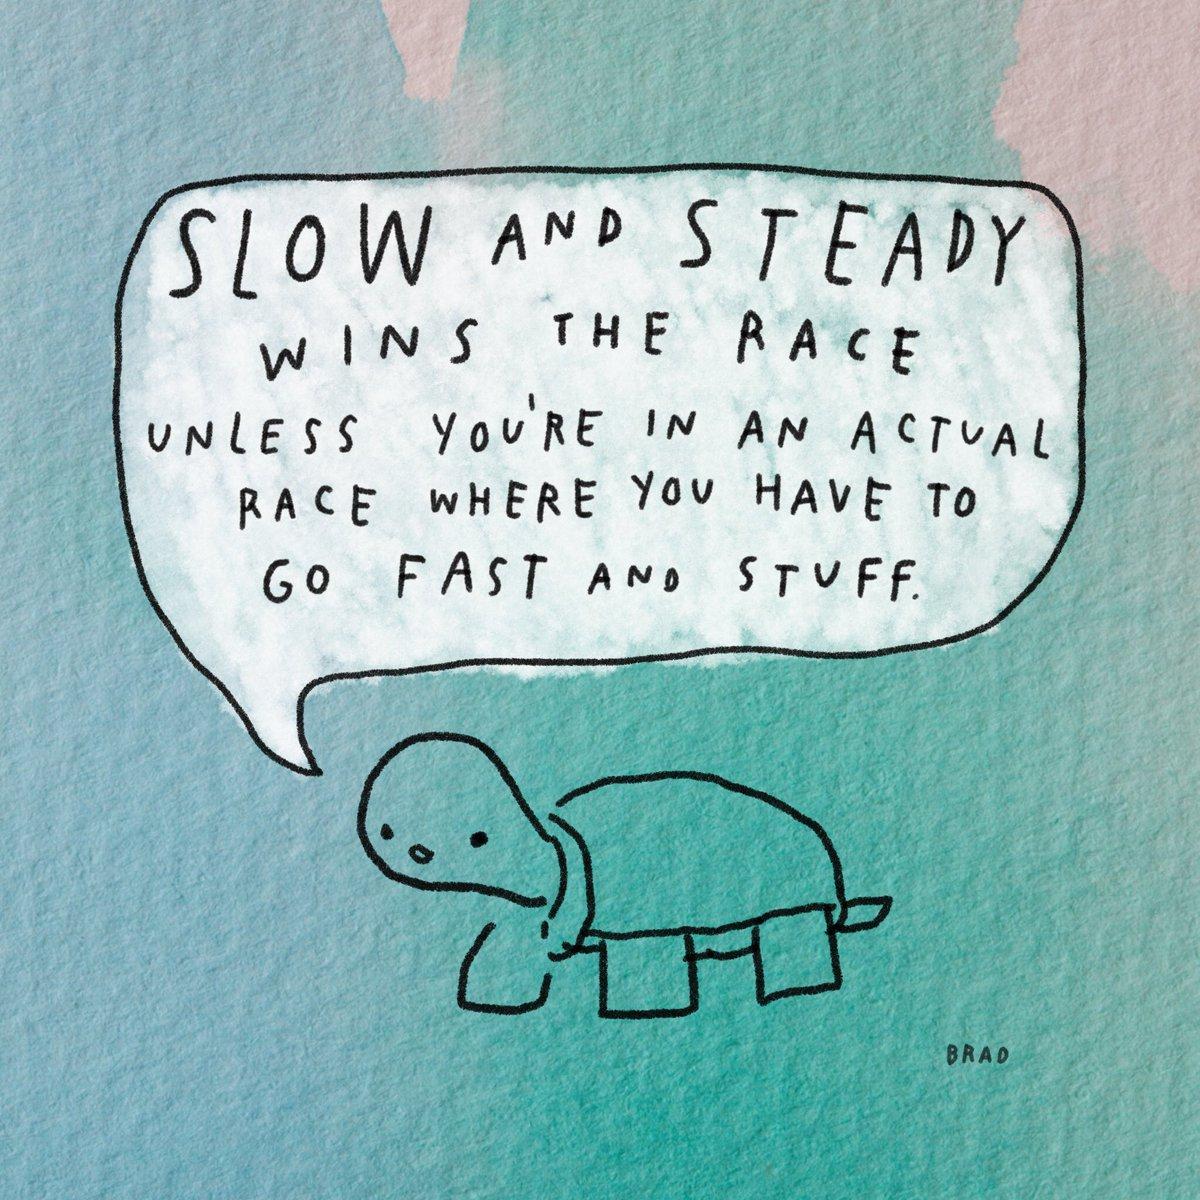 Motivational Turtle is not very good at pep talks. instagram.com/p/BpzFiFDAuxM/